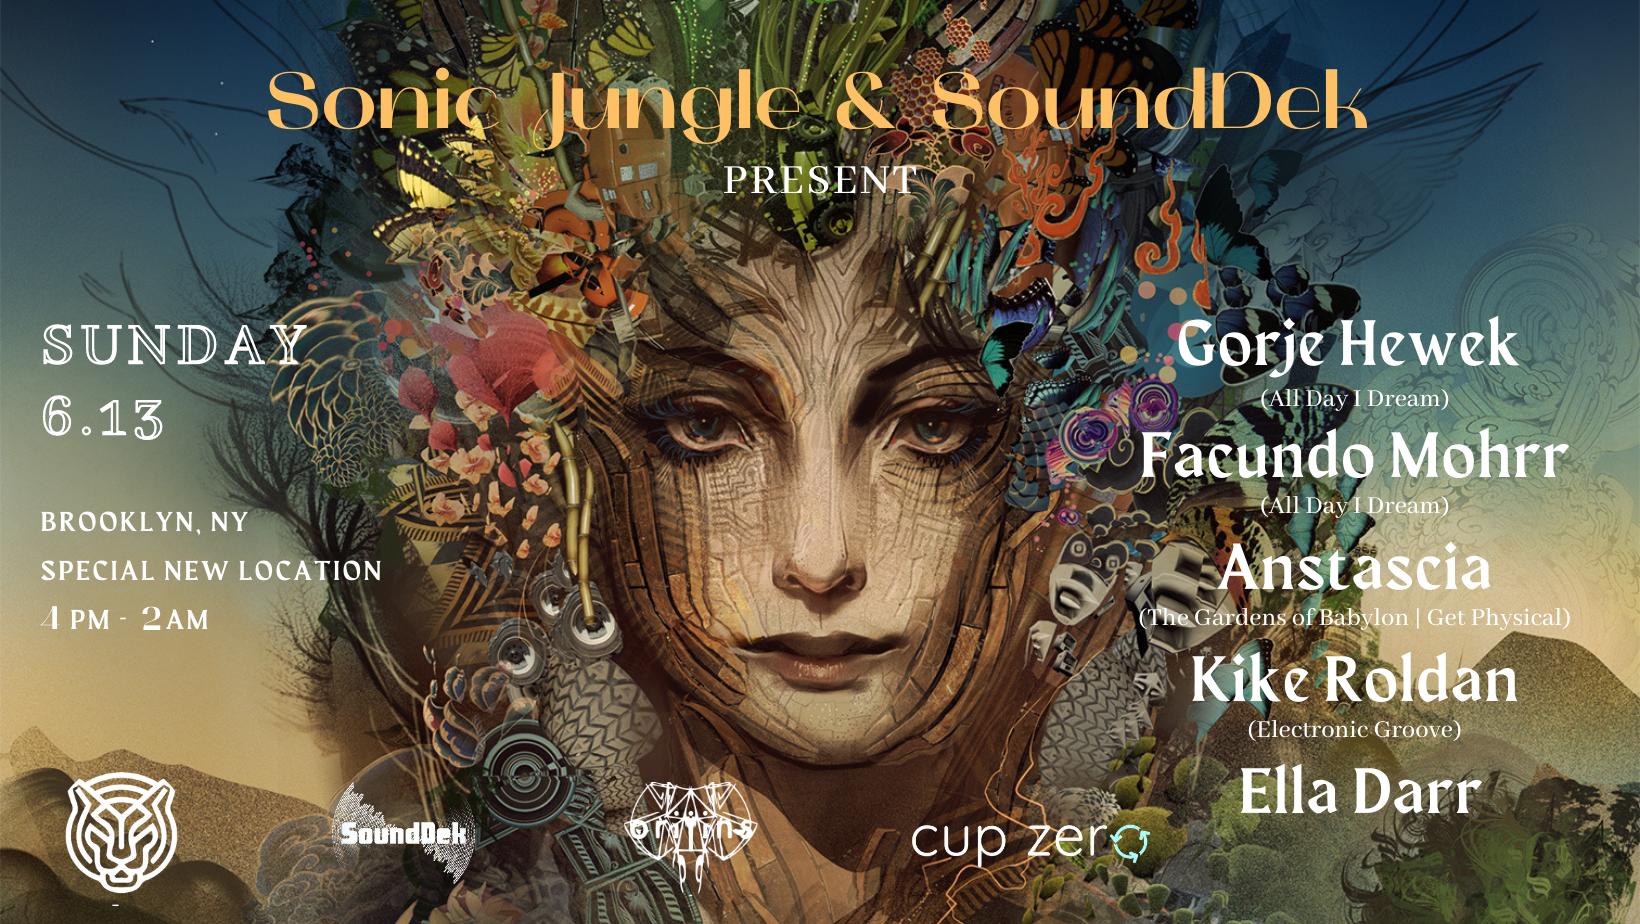 Sonic Jungle & SoundDek Present: 6.13 Gorje Hewek,Facundo Mohrr & more